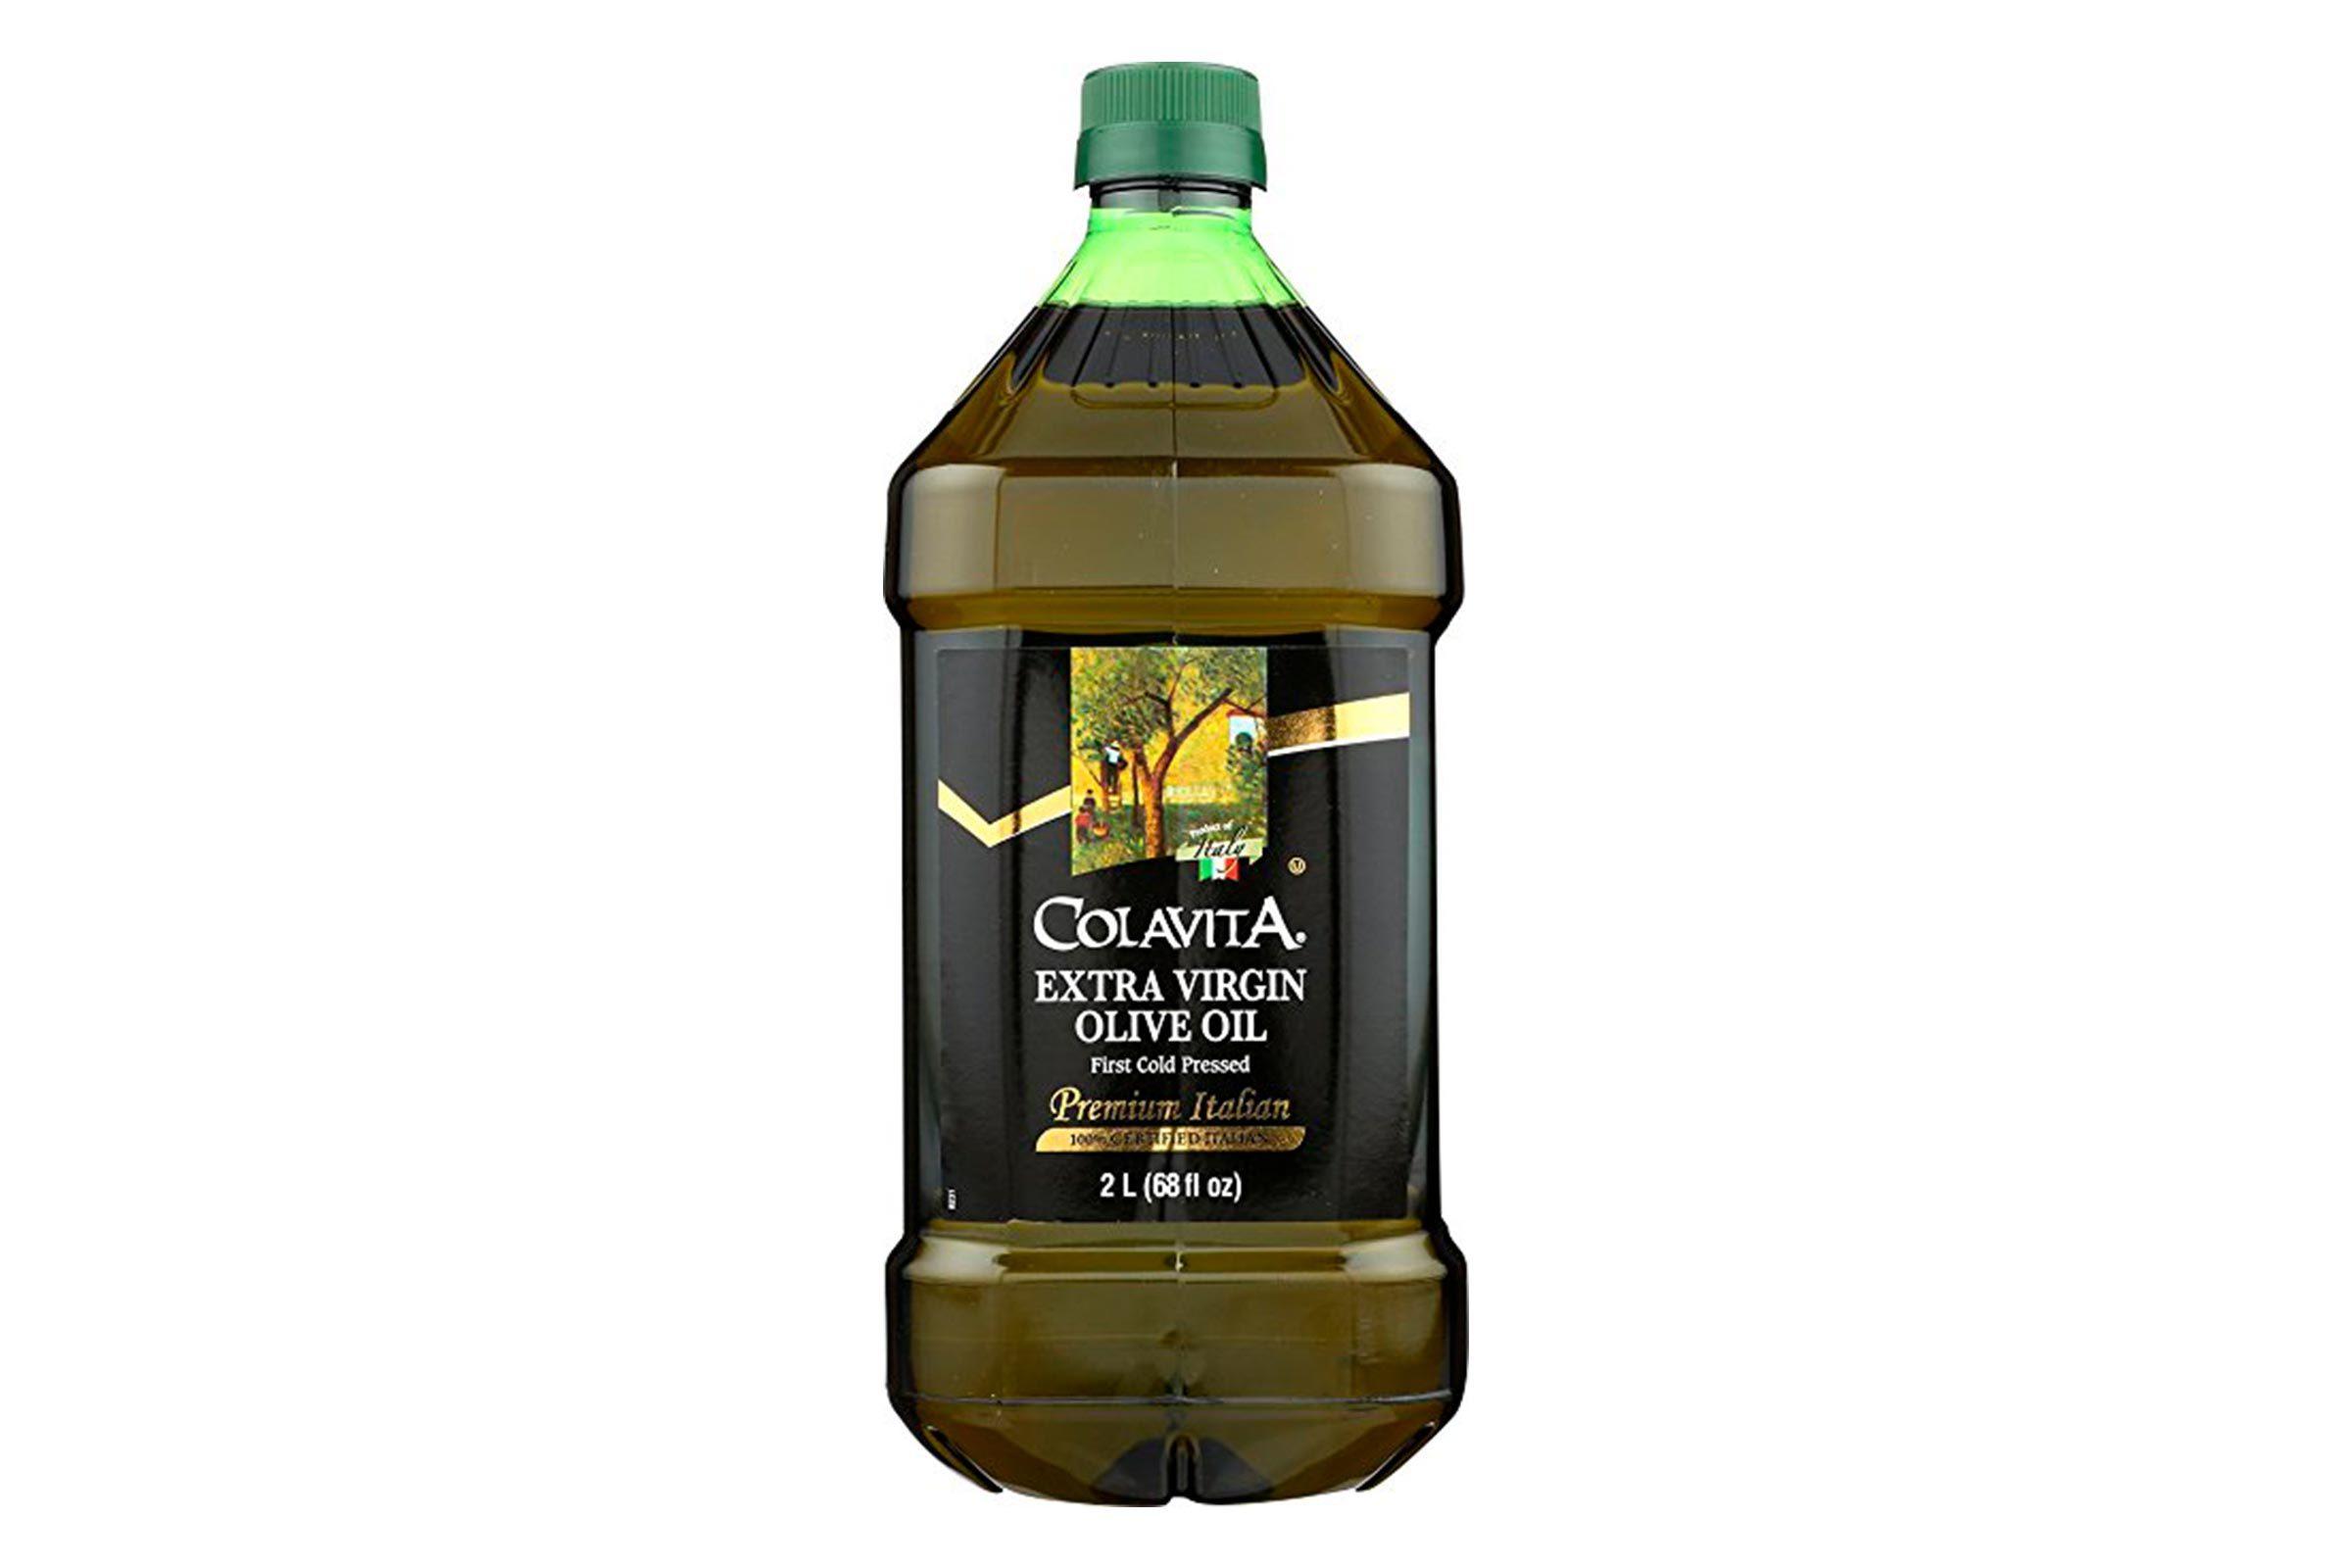 Colavita Olive Oil